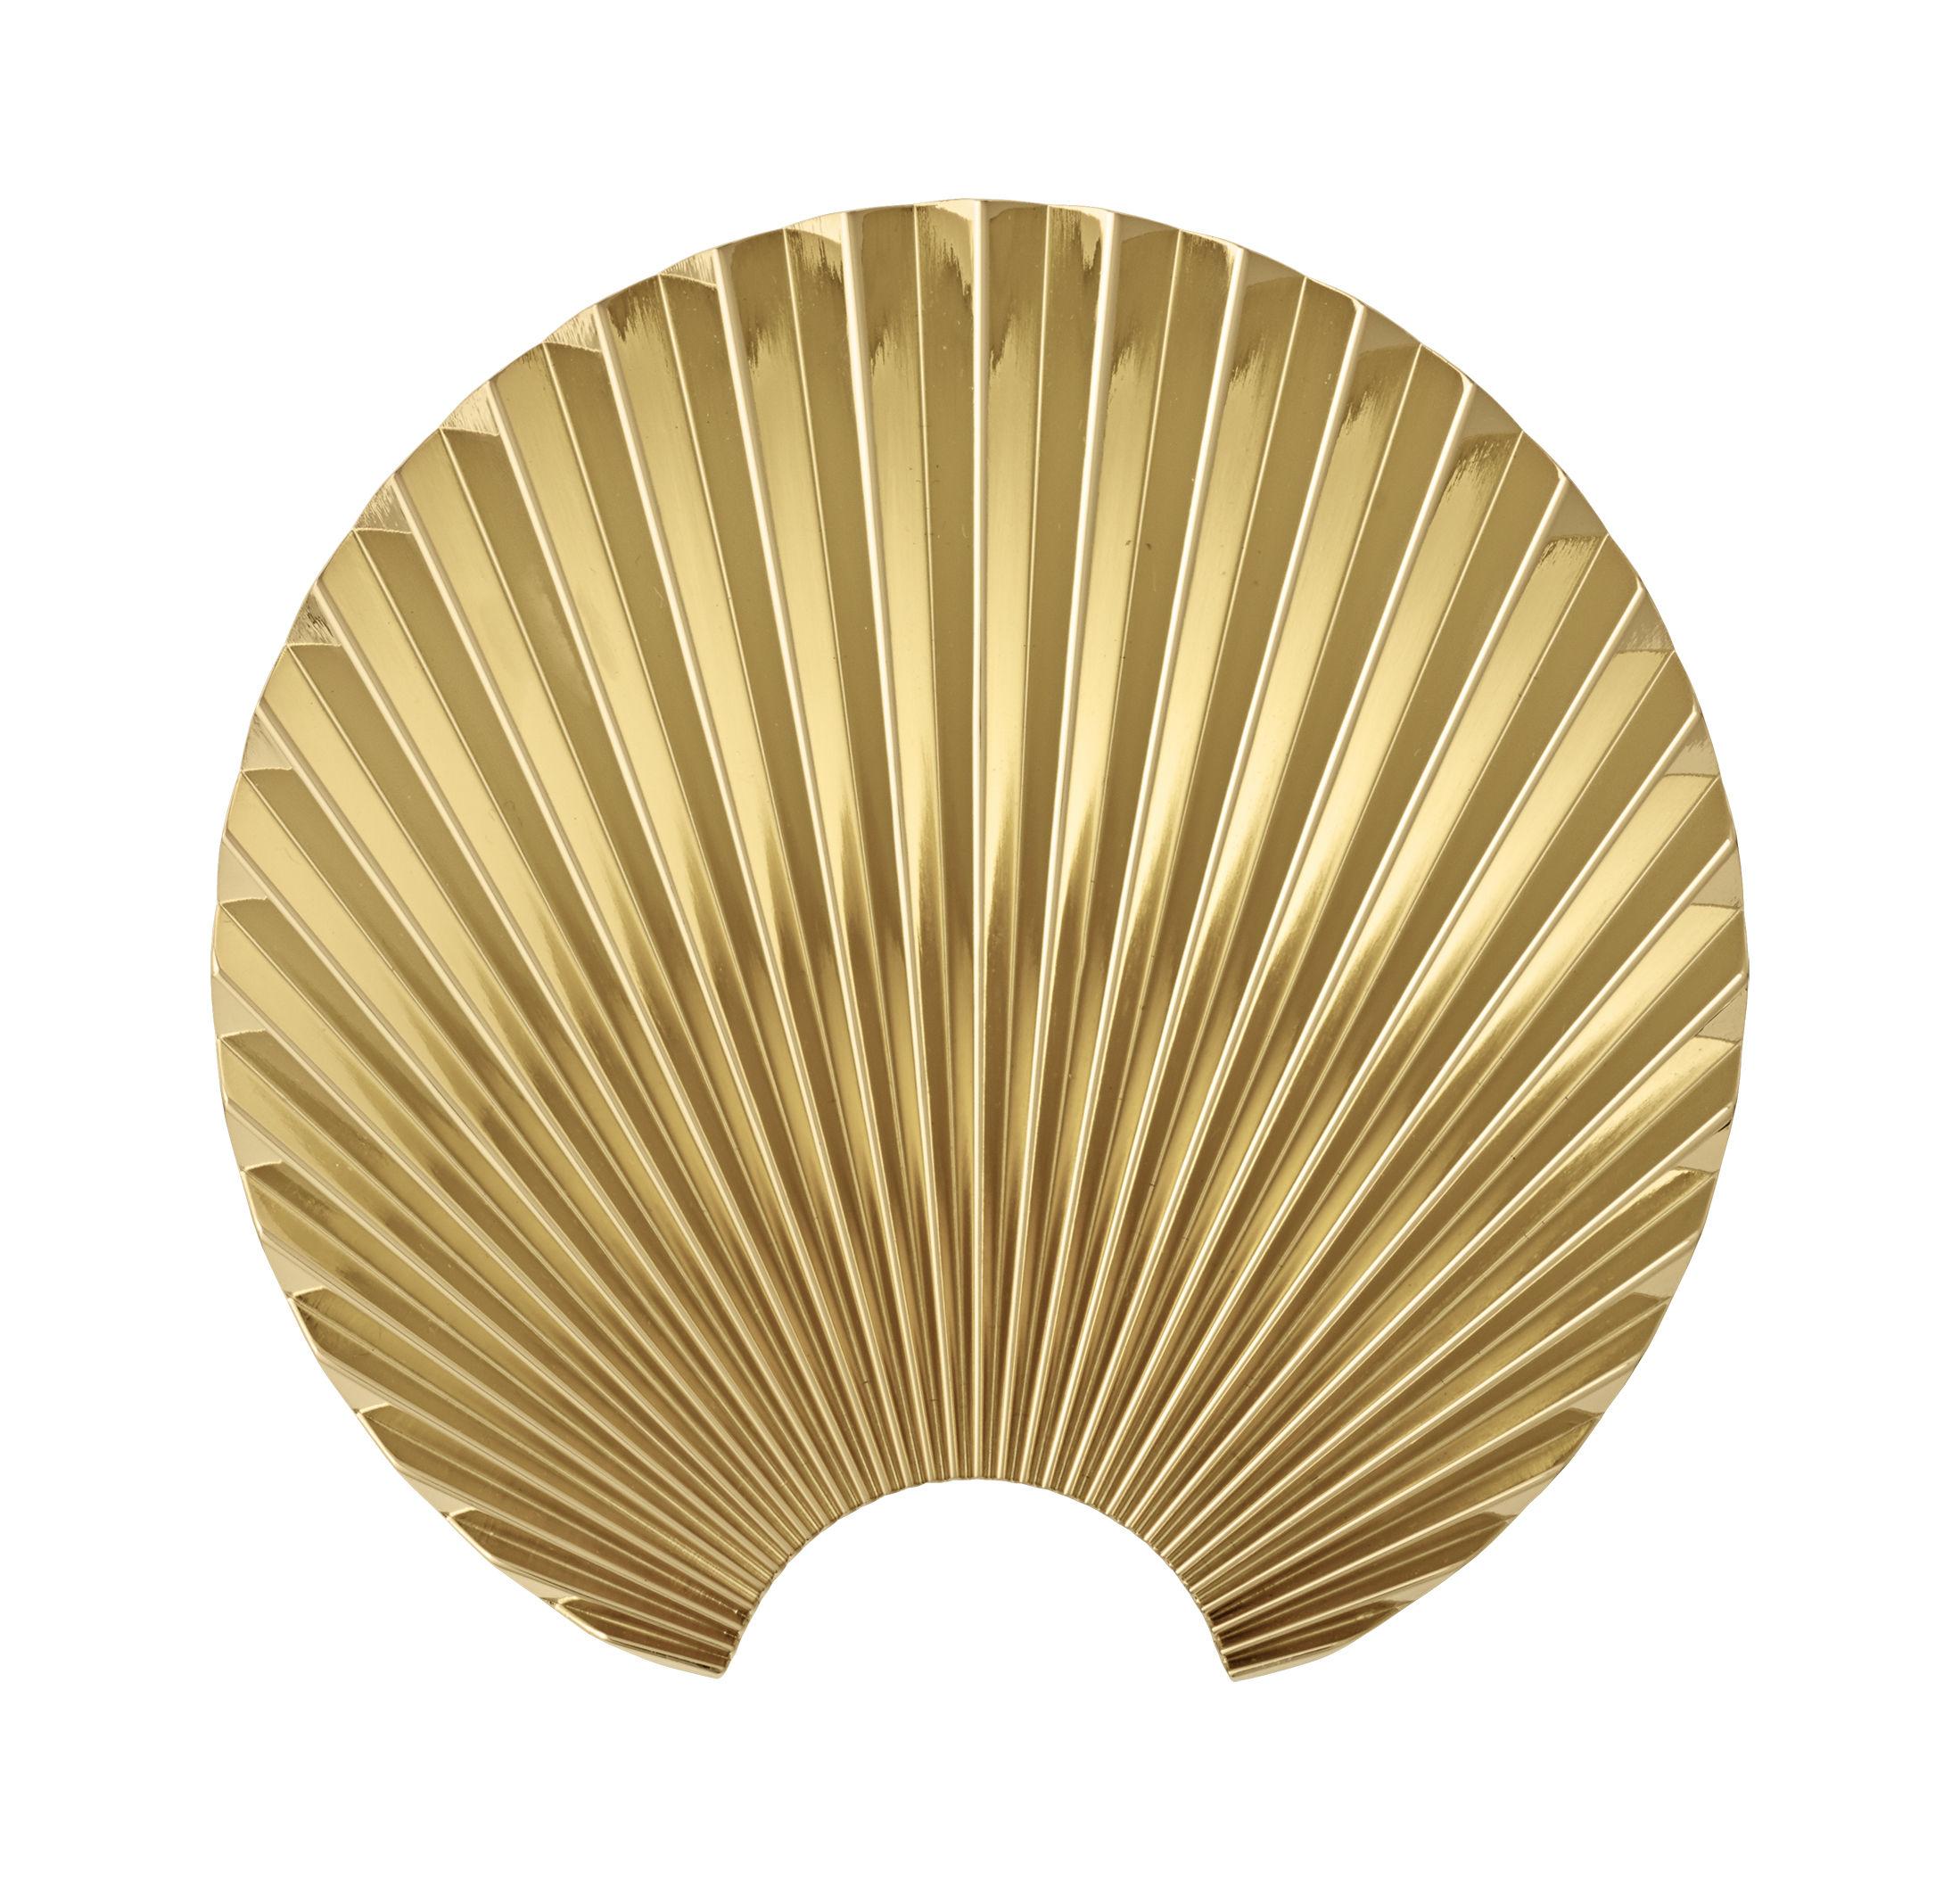 Furniture - Coat Racks & Pegs - Concha Hook - / Zamak - L 4.8 x H 15.5 cm by AYTM - Gold - Zamac